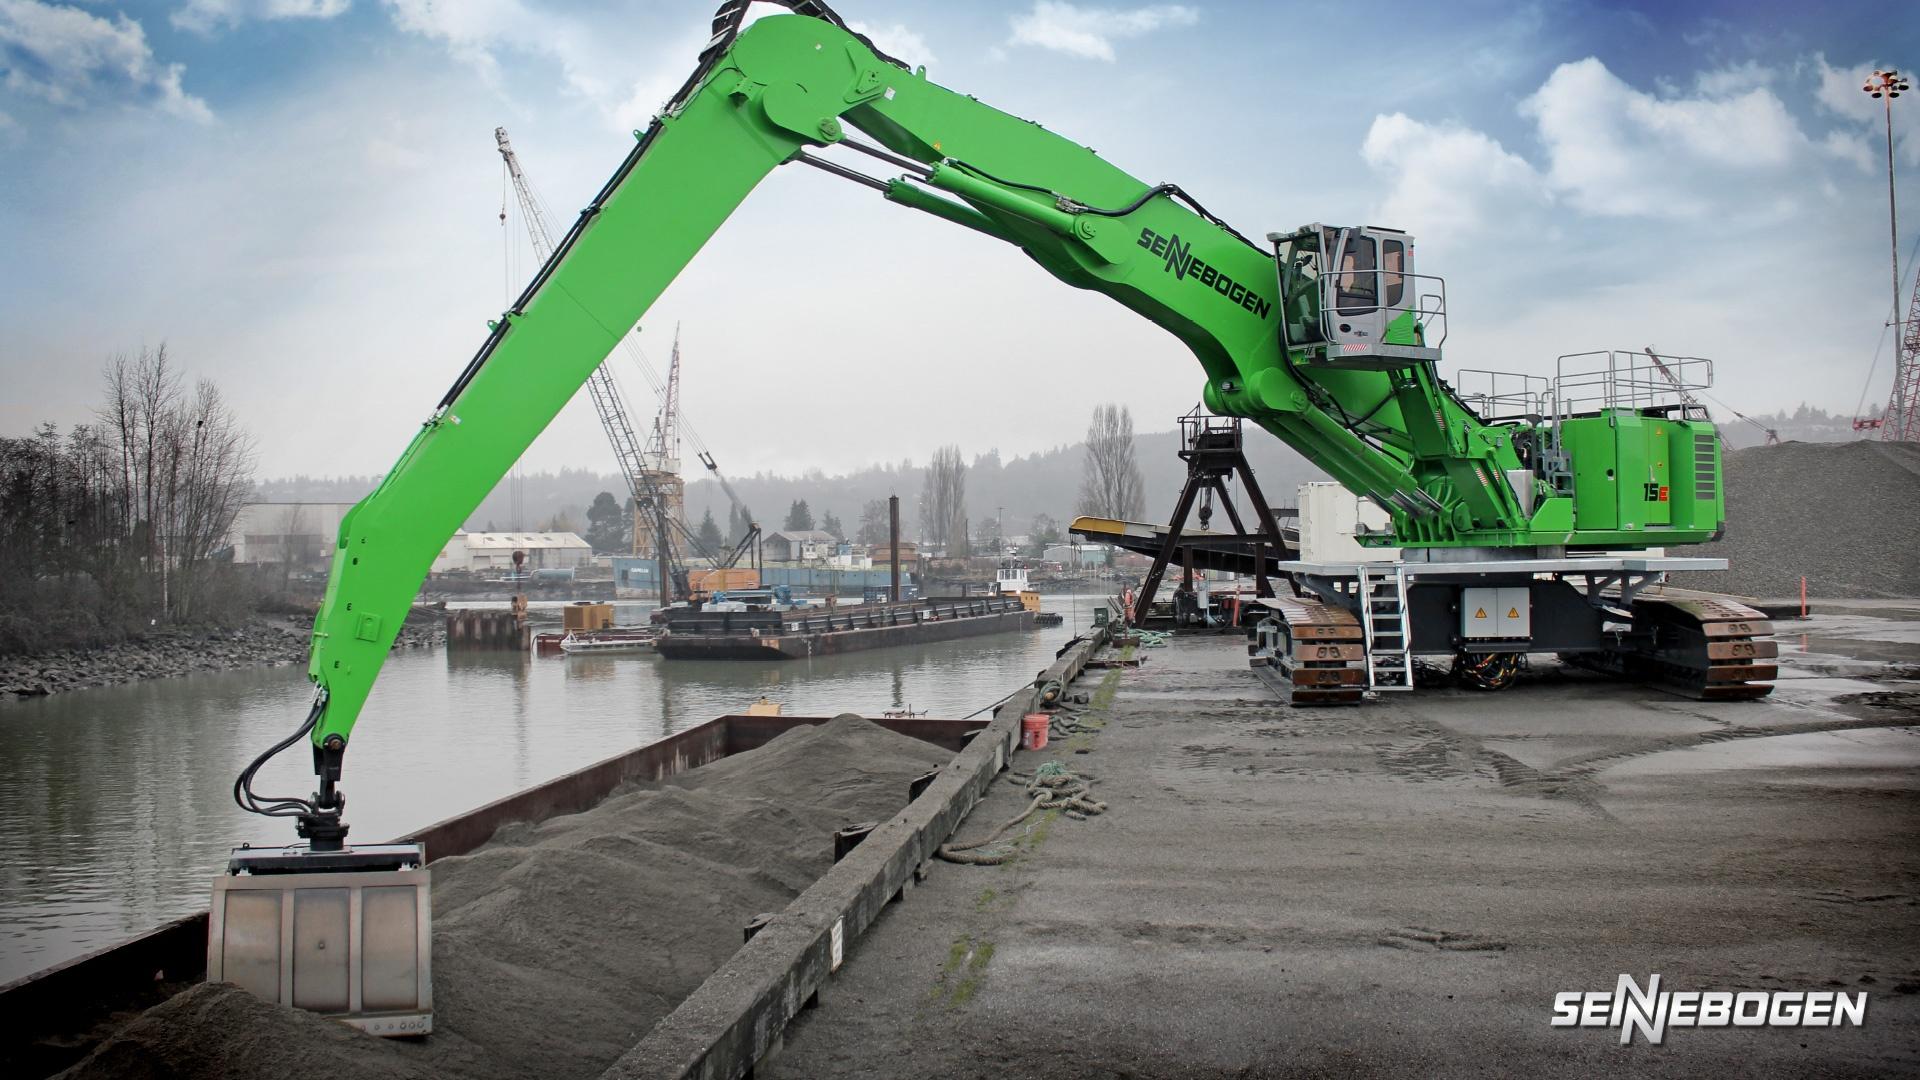 Port equipment maintenance, port equipment, sennebogen